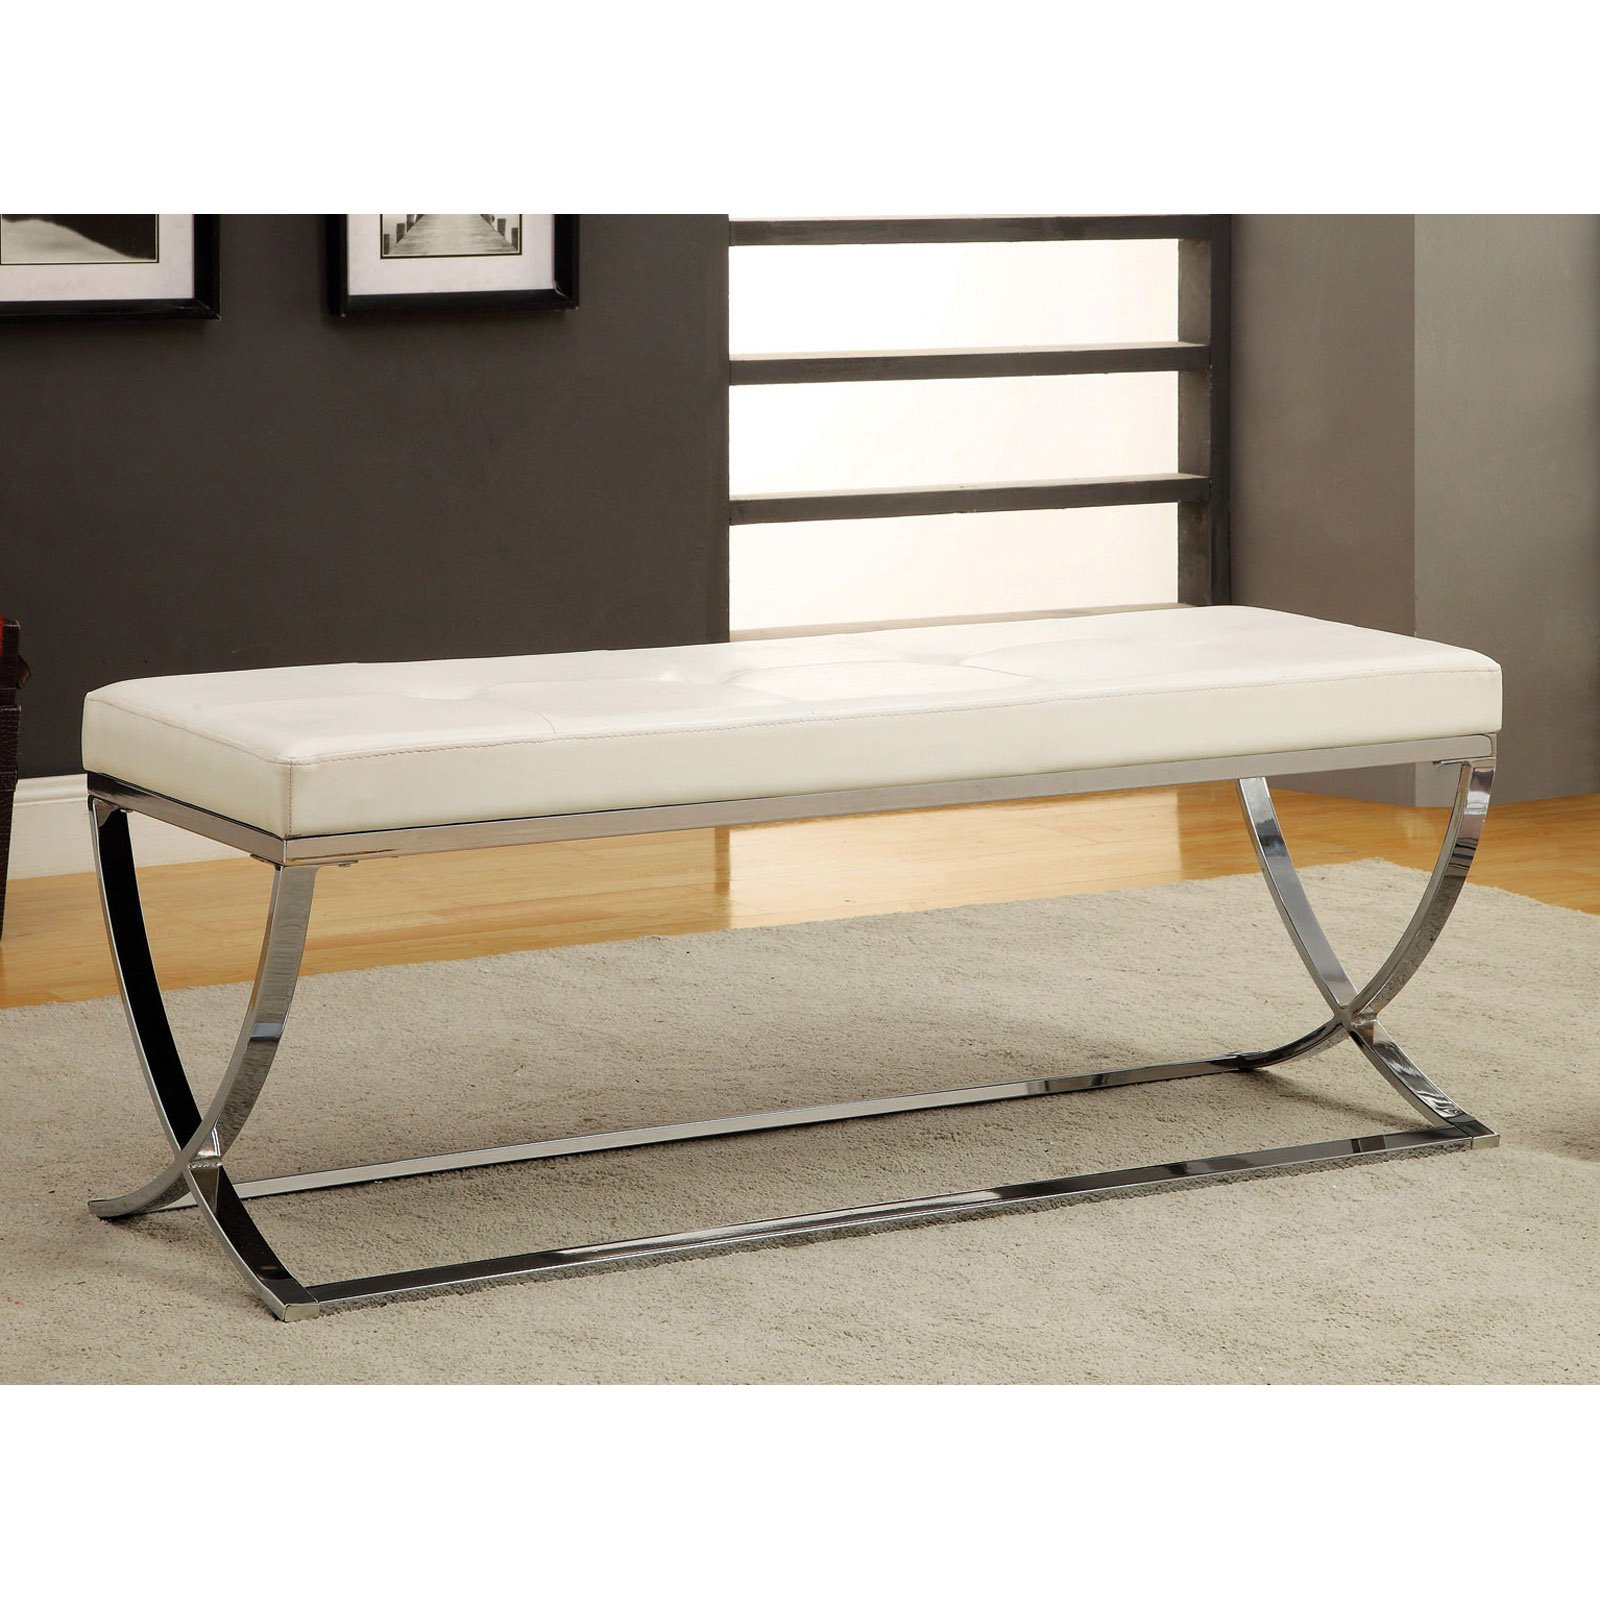 Coaster Furniture Calipatria Bedroom Bench